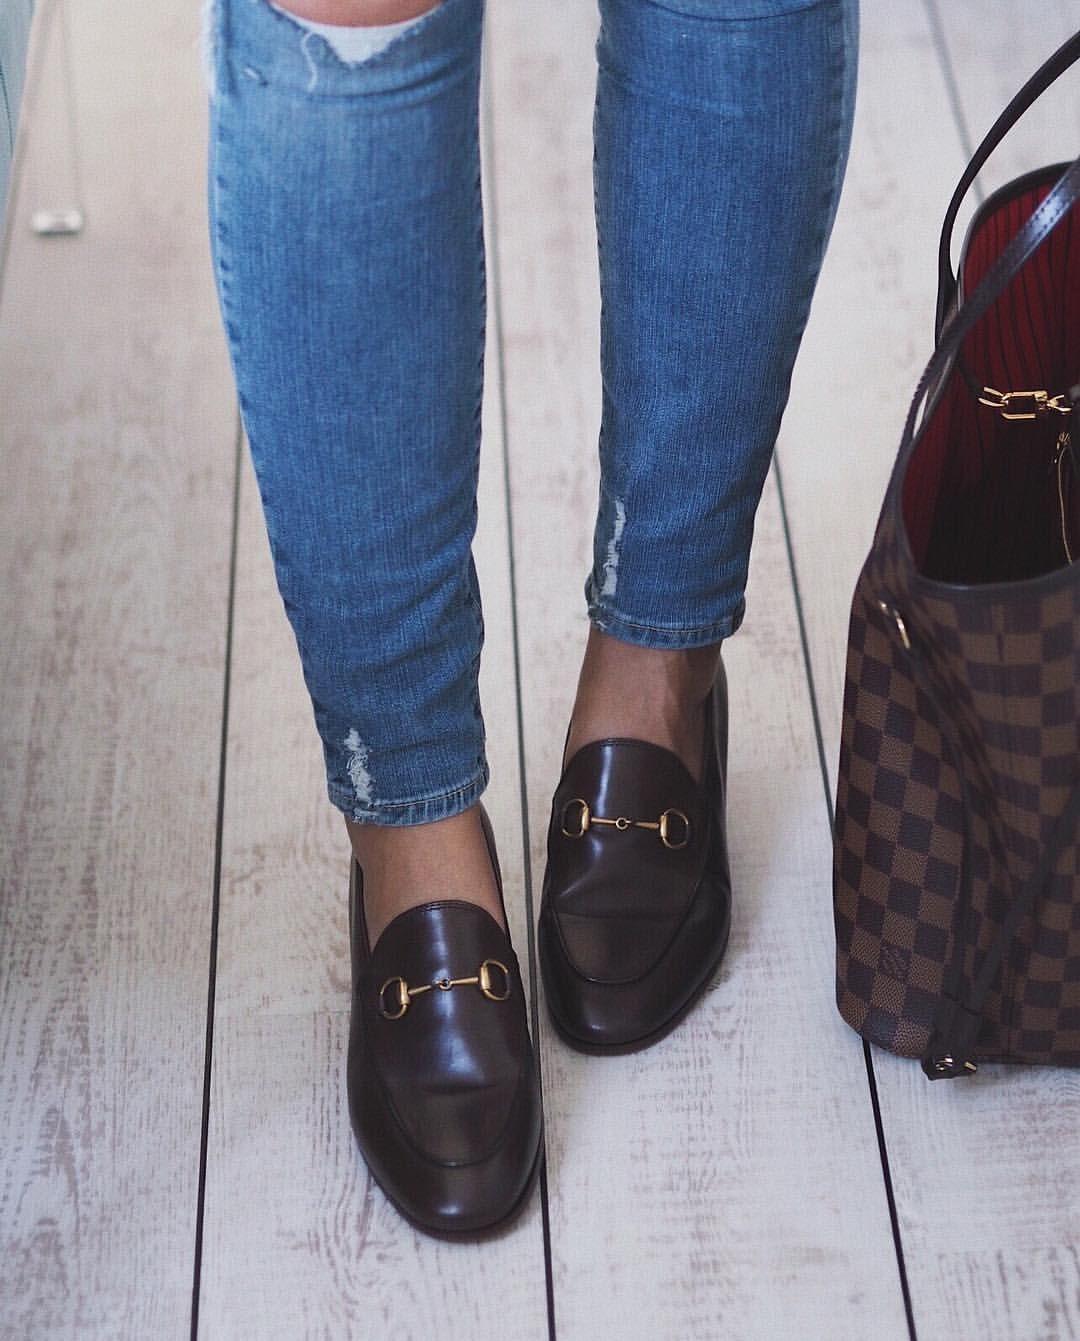 e0428b7c86 Instagram @emilyjanehardy - Paige blue denim jeans, Gucci brown ...